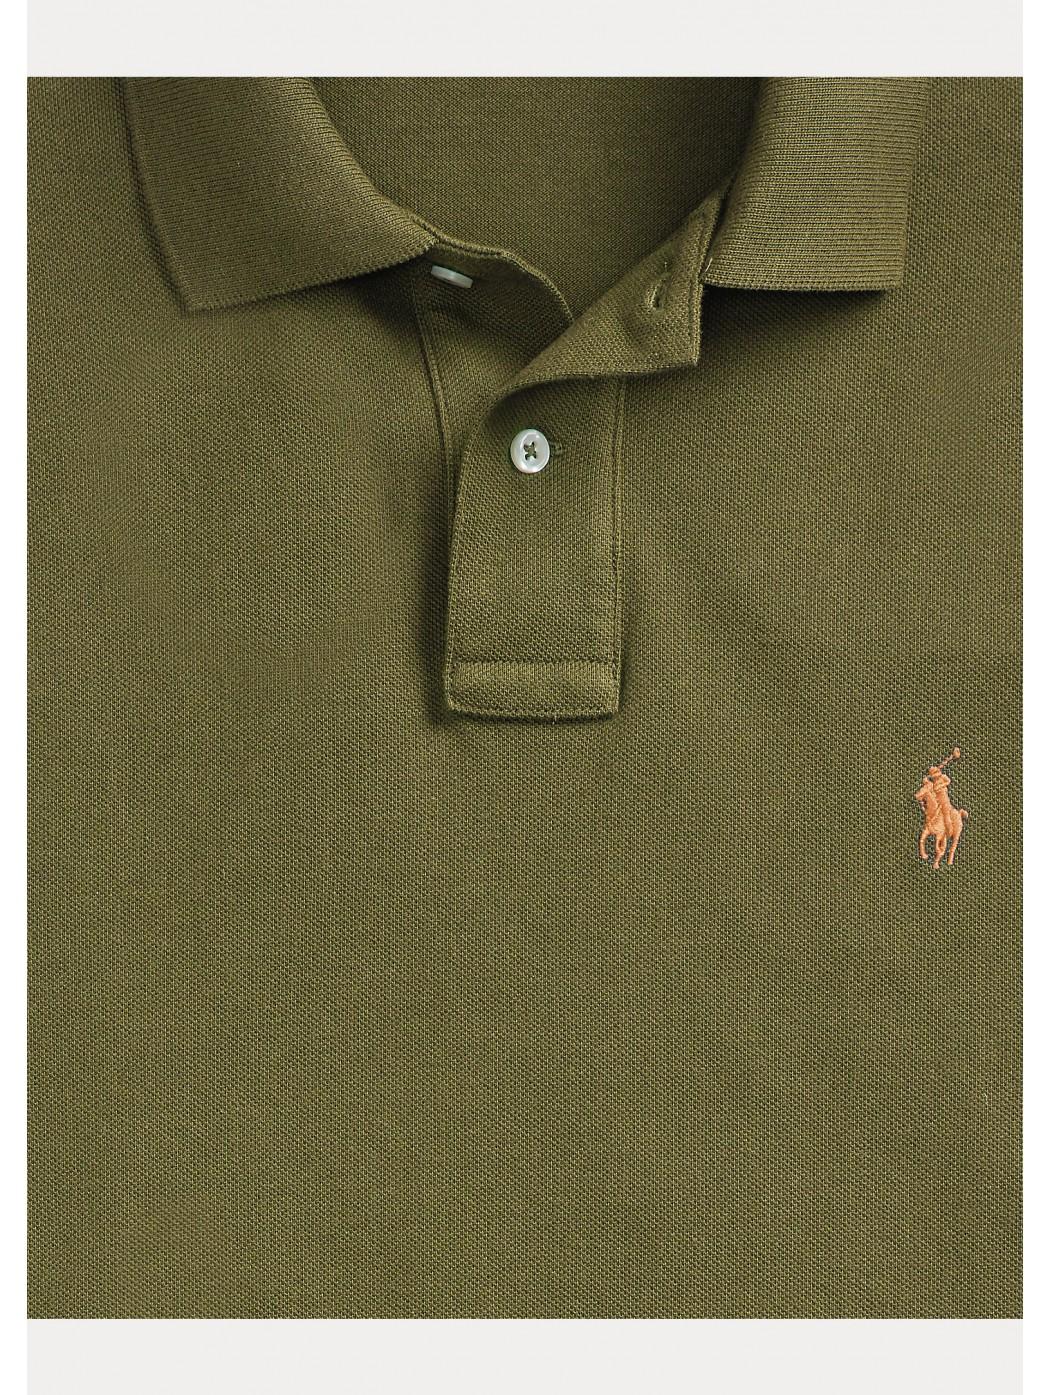 Polo in piqu' Slim-Fit POLO RALPH LAUREN UOMO 710795080 017